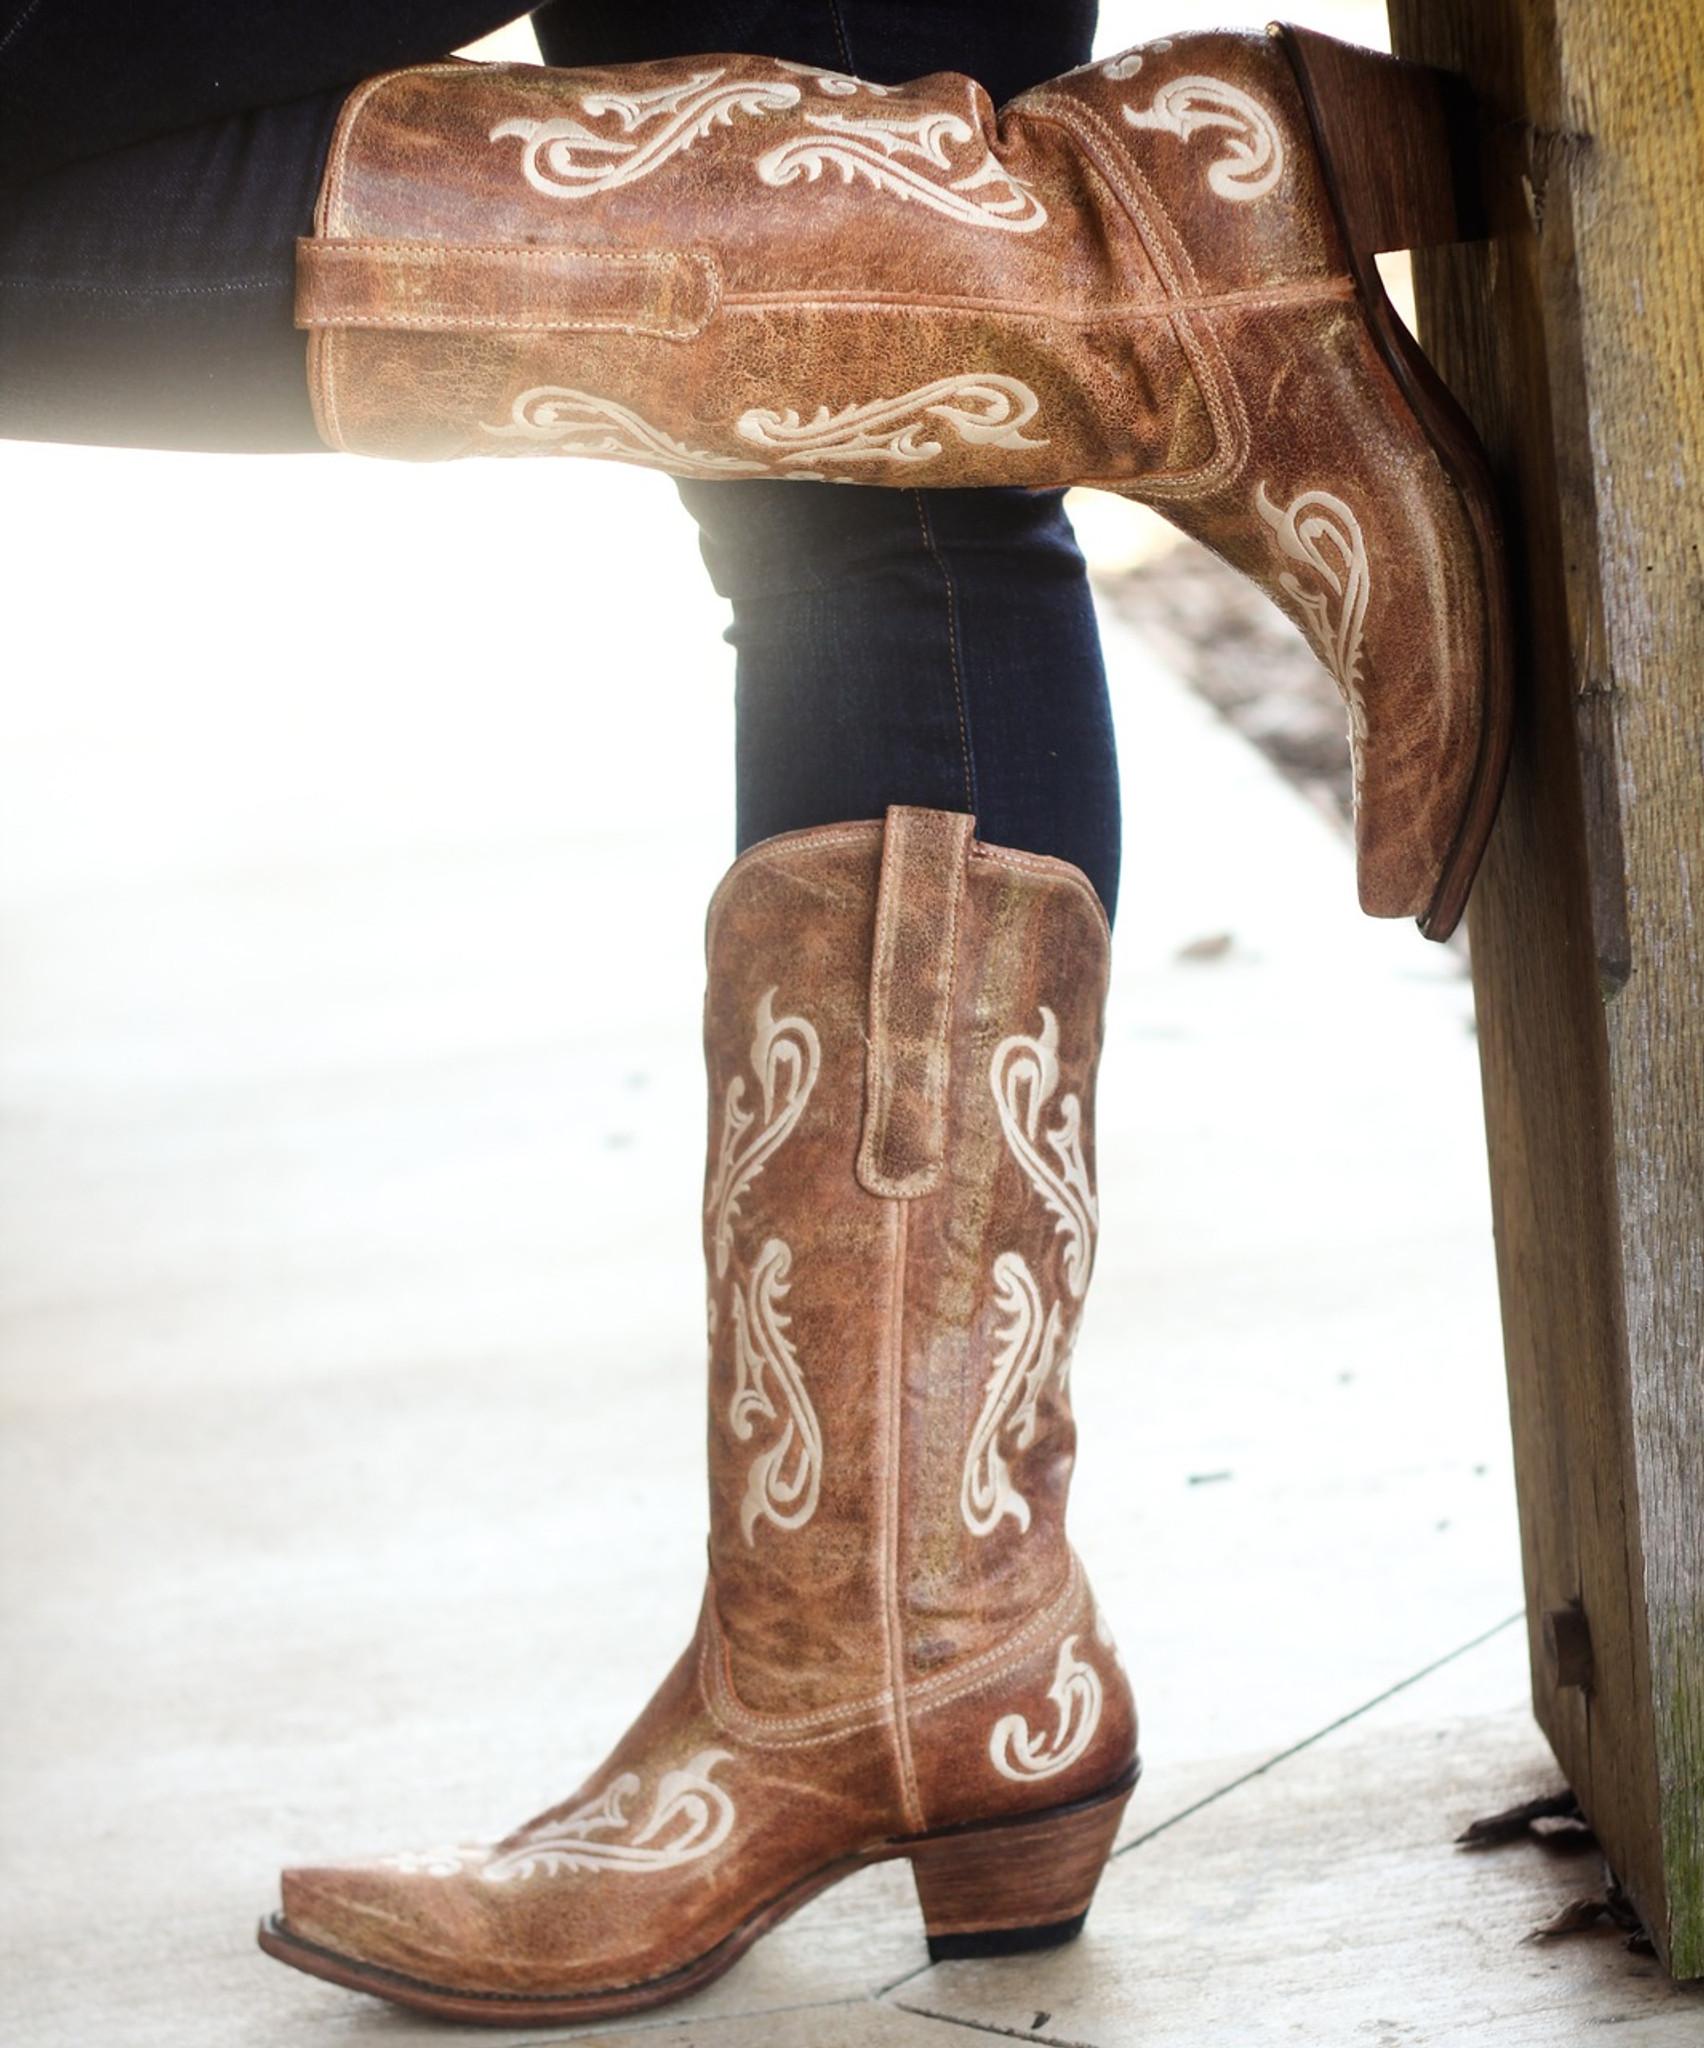 992b7ba0ca7 Corral Honey Cortez Boots R1974